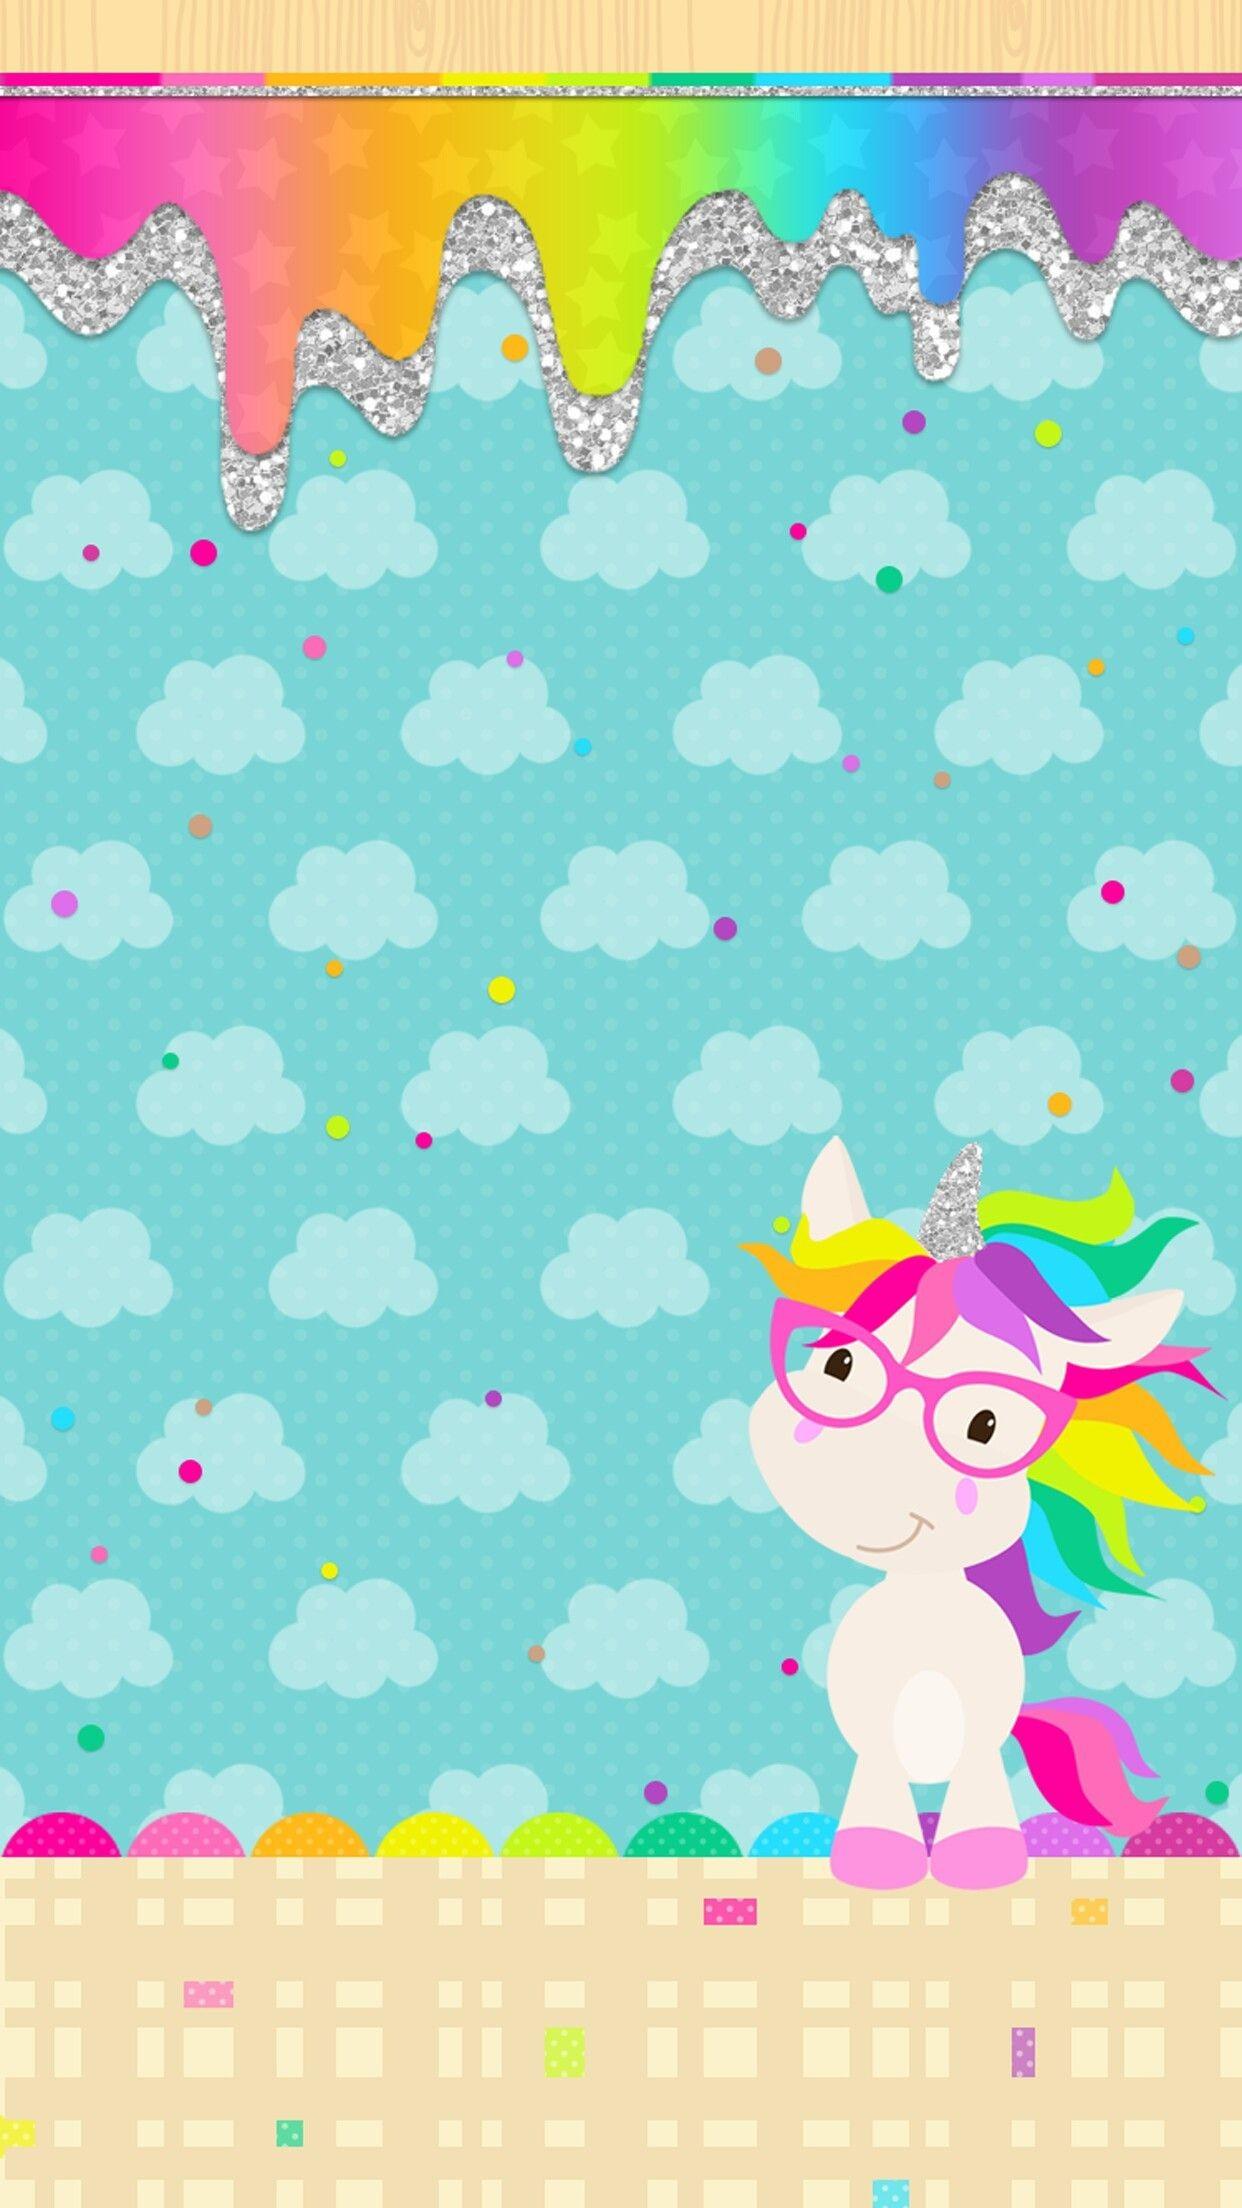 Unicorn Wallpapers Cute Unicorn Rainbow Hd 92907 Hd